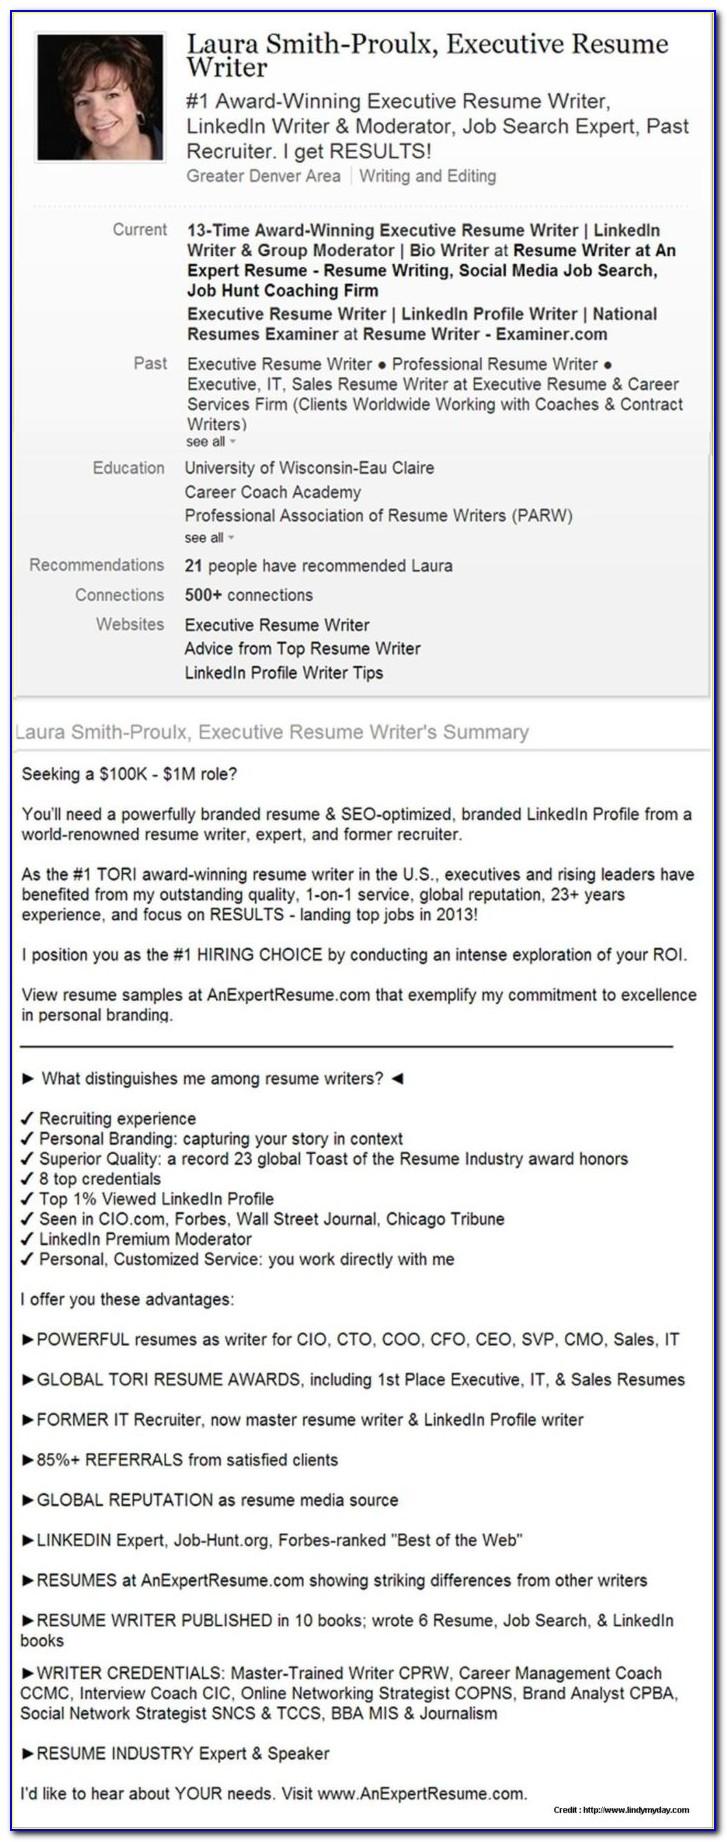 Resume Writing Services Denver Co